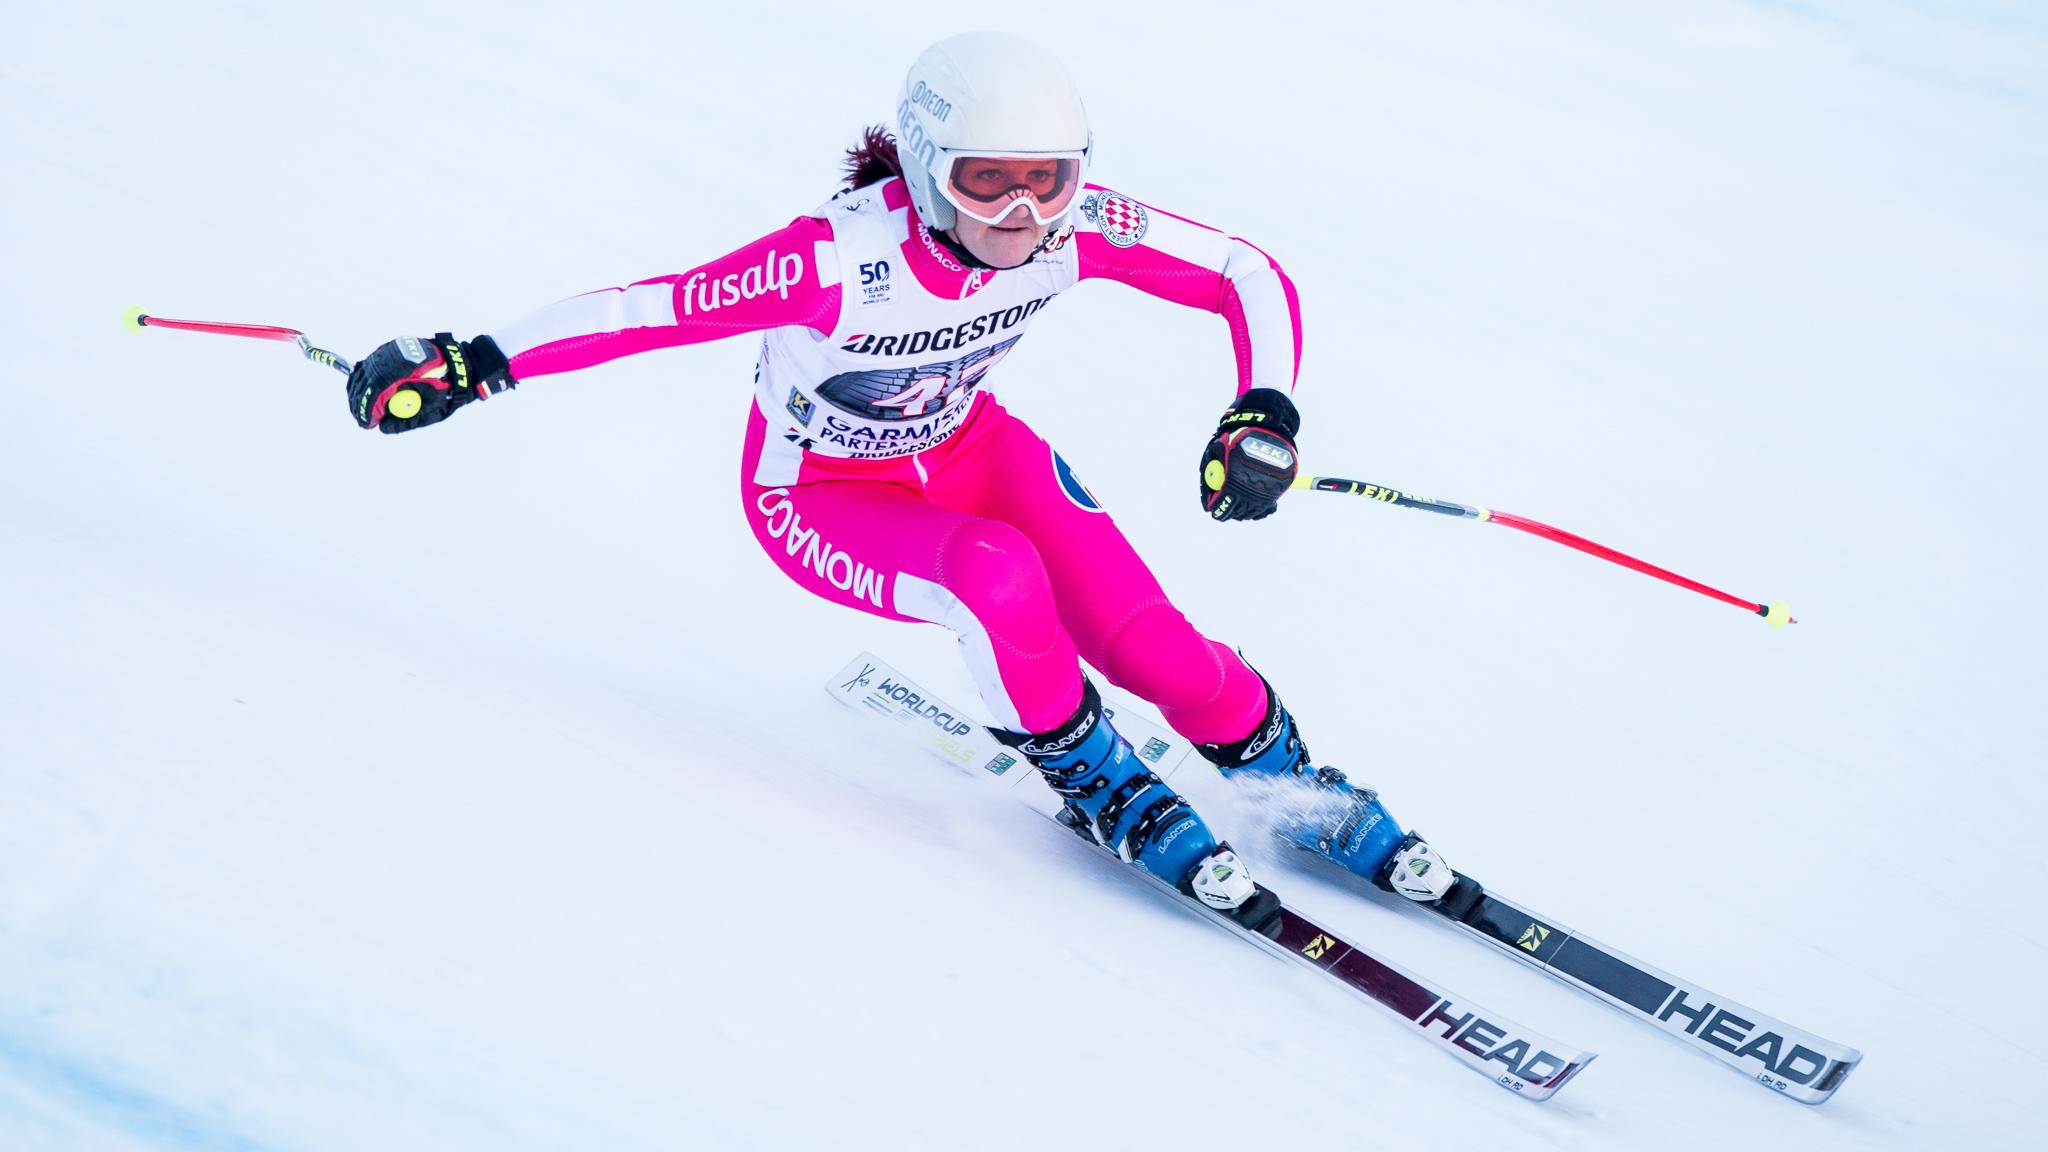 7889ceaa1bfd File 2017 Audi FIS Ski Weltcup Garmisch-Partenkirchen Damen - Alexandra  Coletti - by 2eight - 8SC9063.jpg